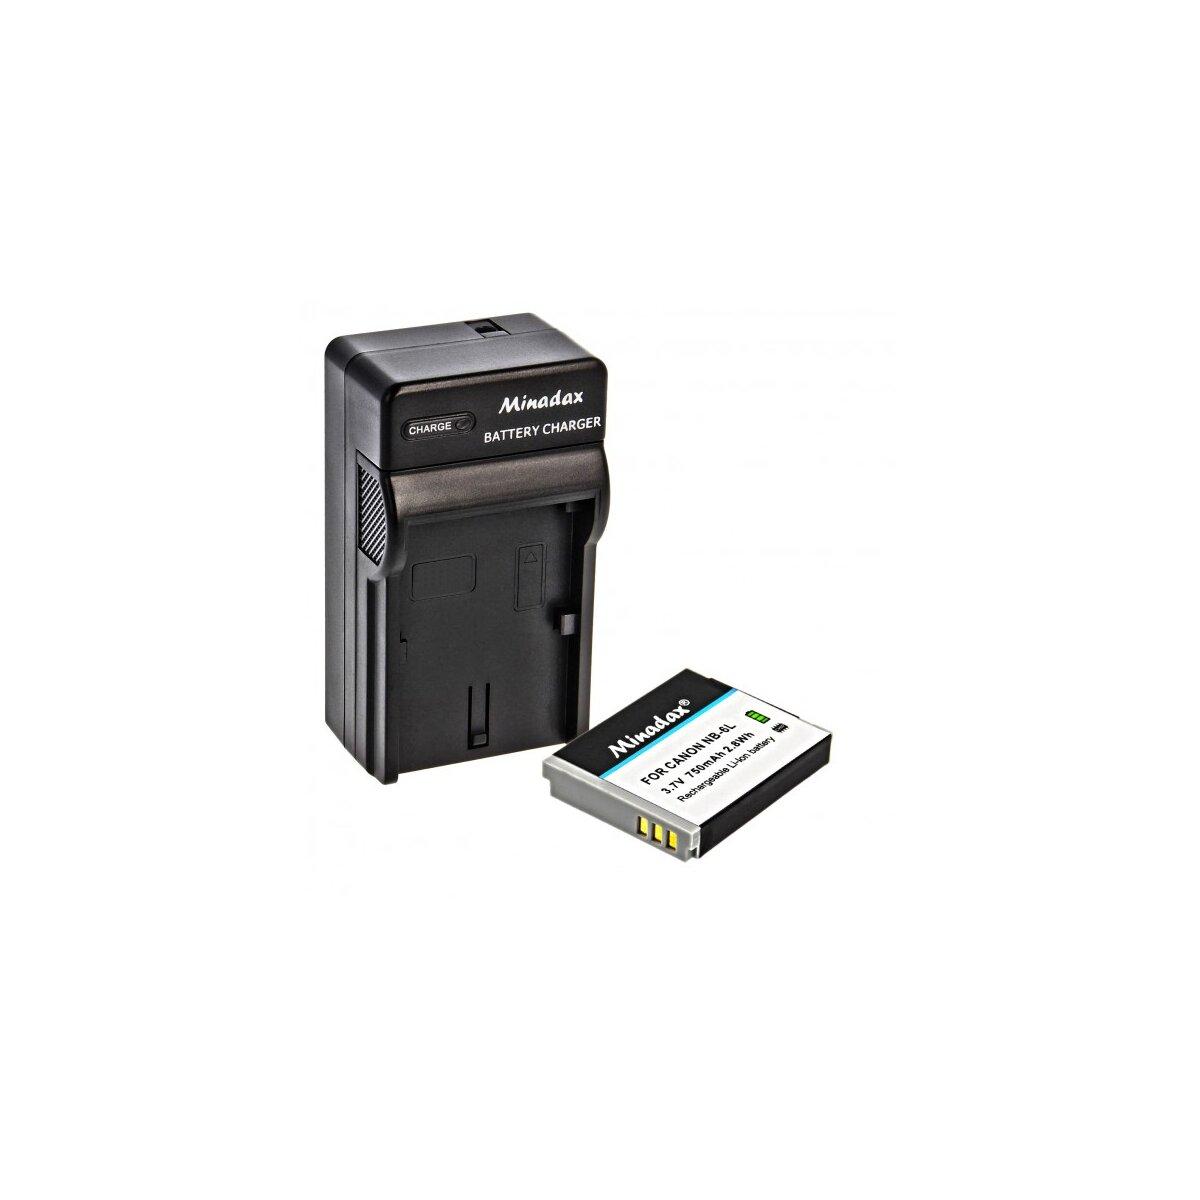 Minadax® Ladegerät 100% kompatibel mit Canon NB-6L inkl. Auto Ladekabel, Ladeschale austauschbar + 1x Akku Ersatz für NB-6L